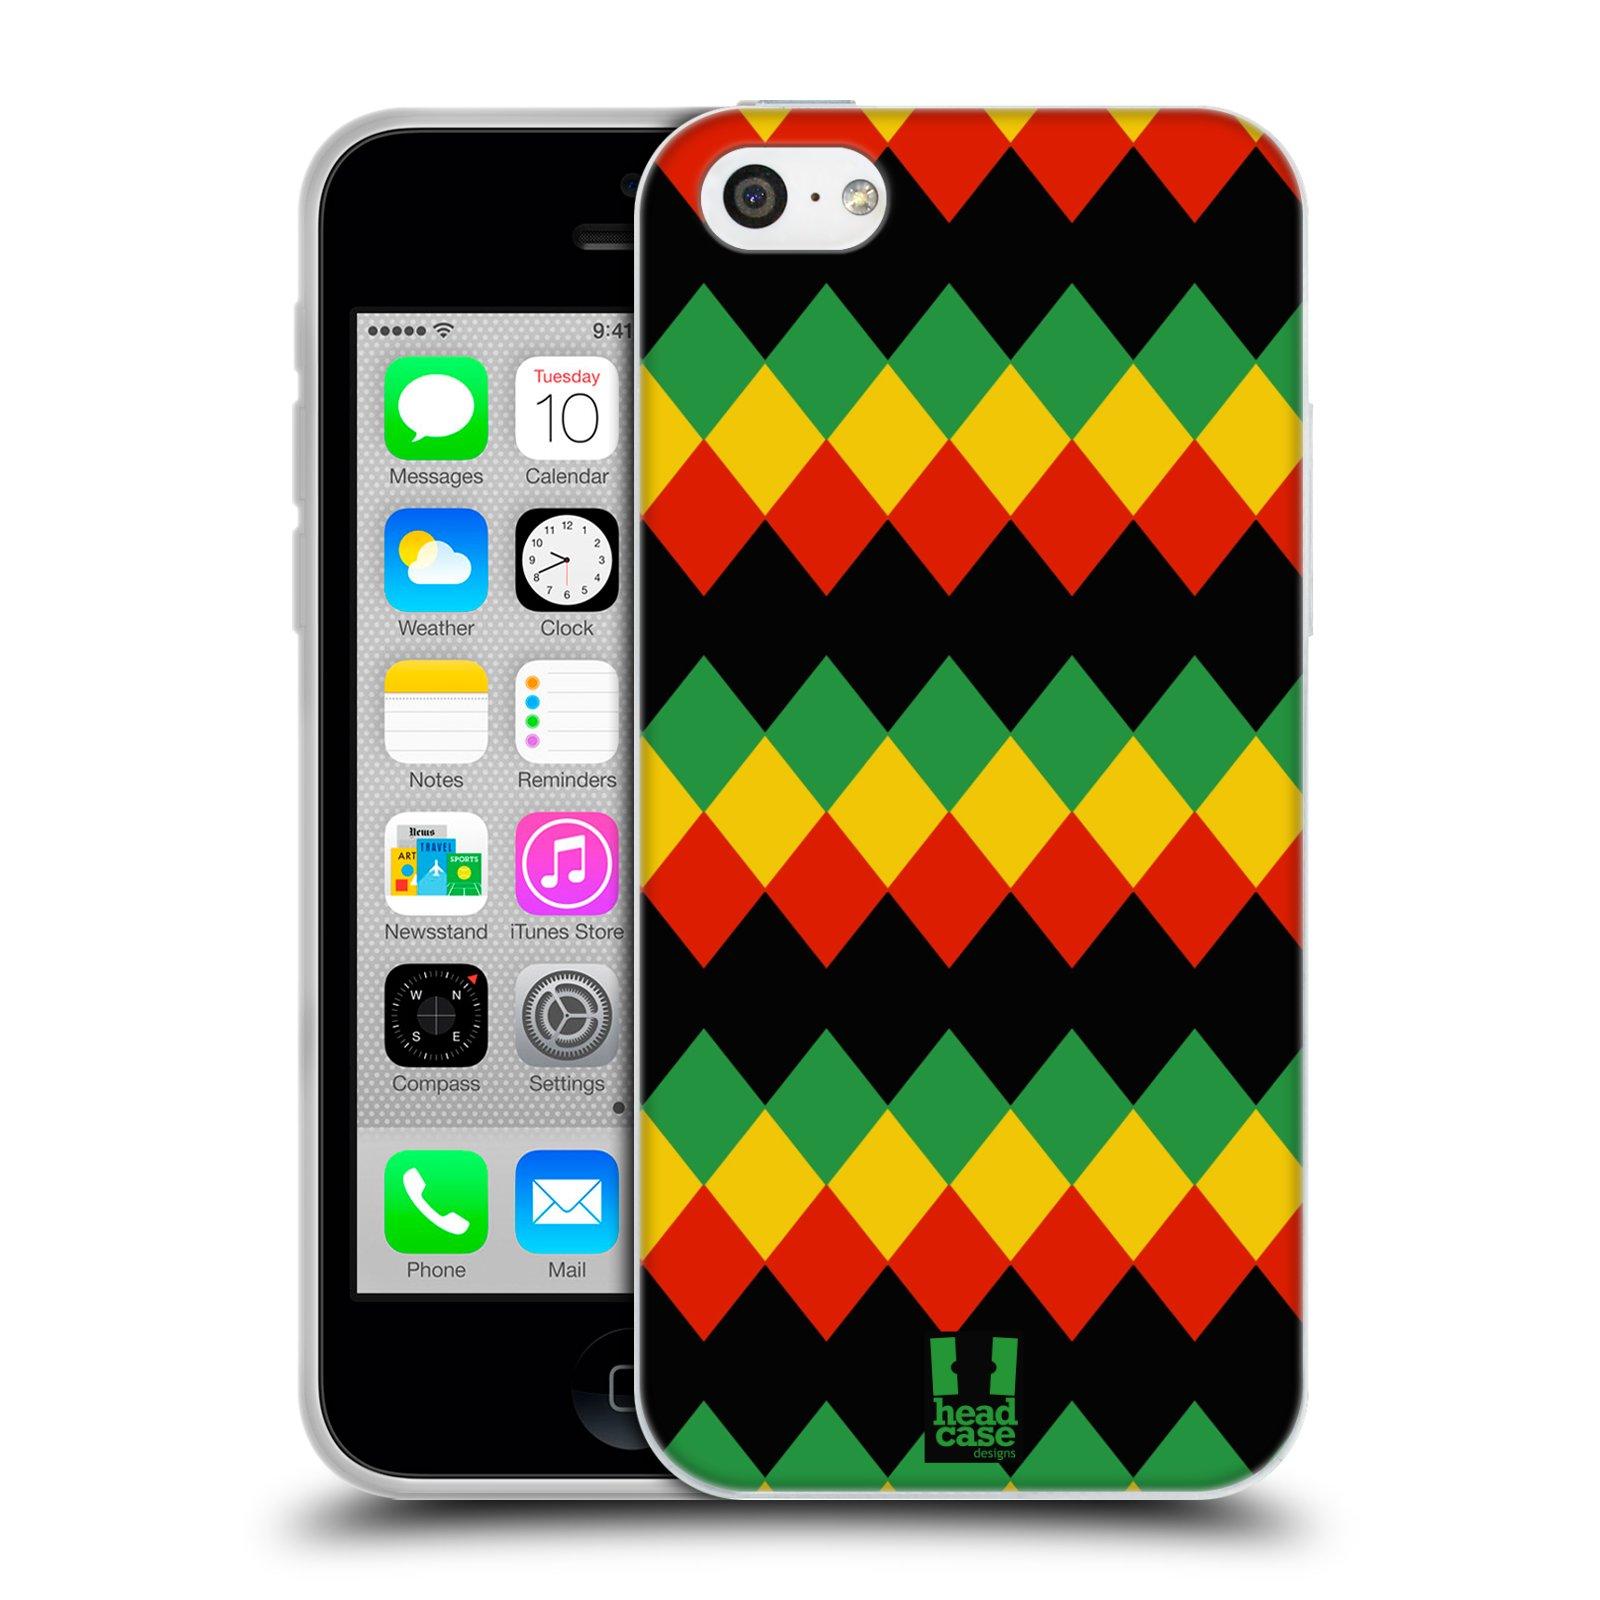 HEAD CASE silikonový obal na mobil Apple Iphone 5C vzor Rasta barevné vzory DIAMANT